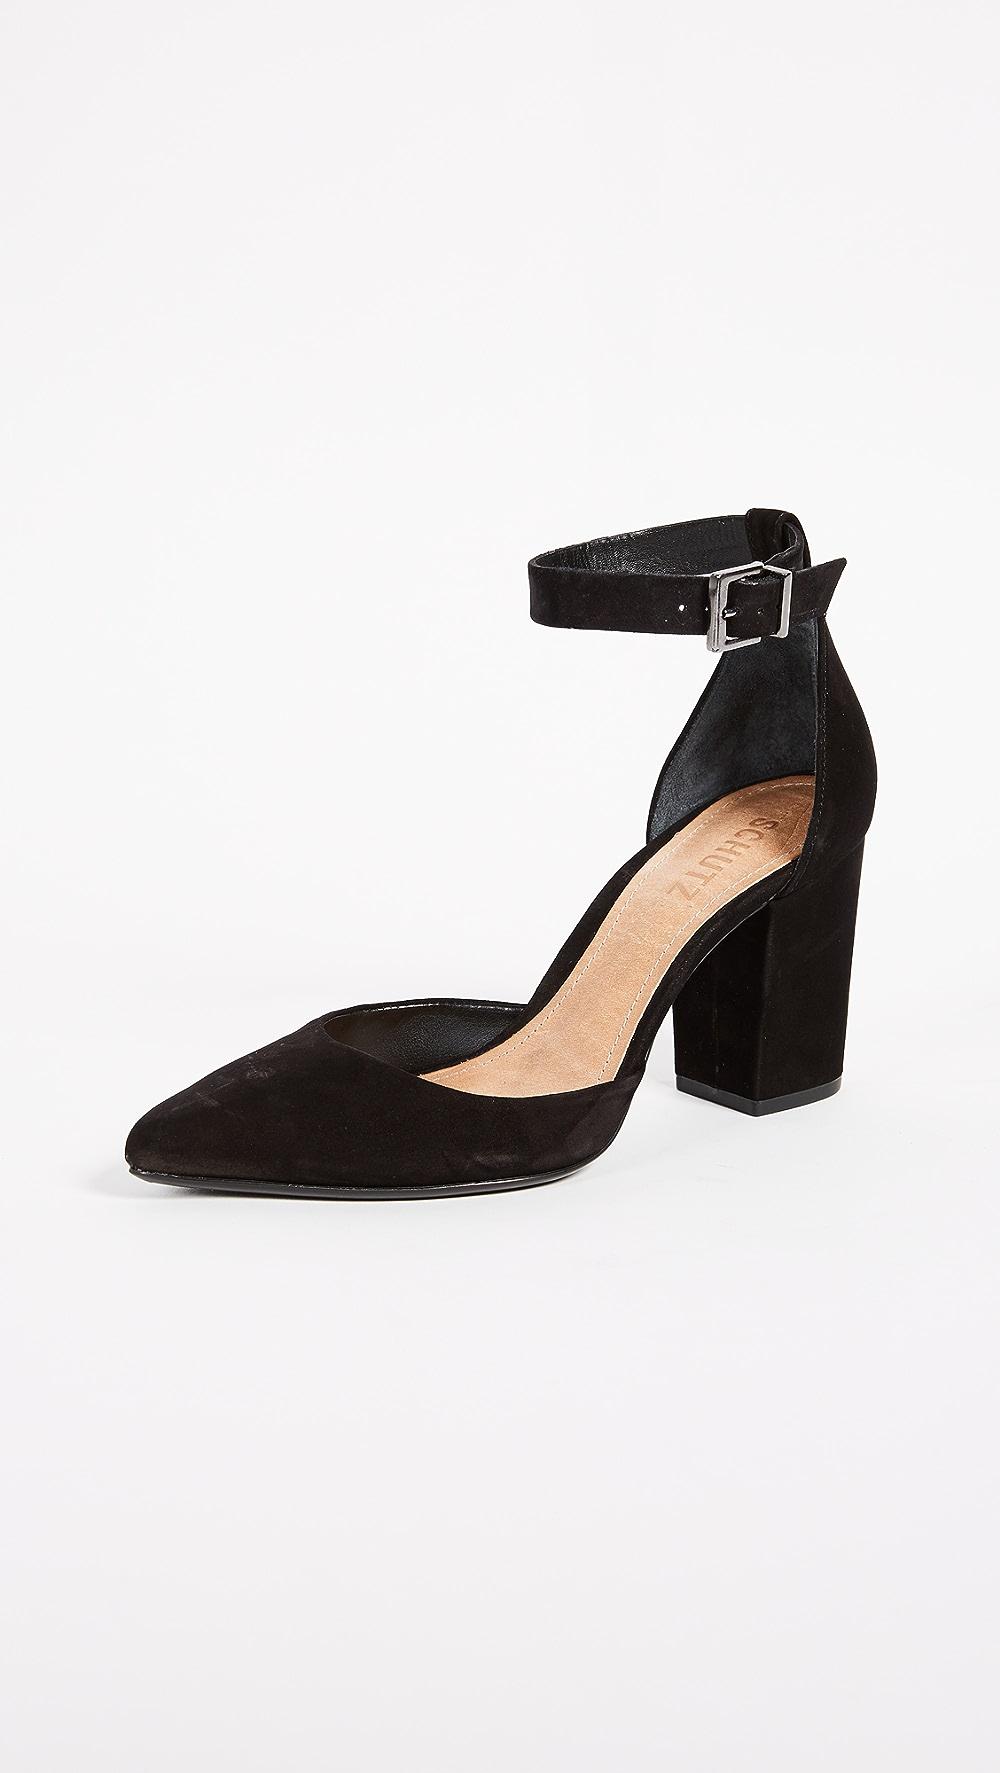 Amiable Schutz - Ionara Ankle Strap Pumps Fashionable Patterns